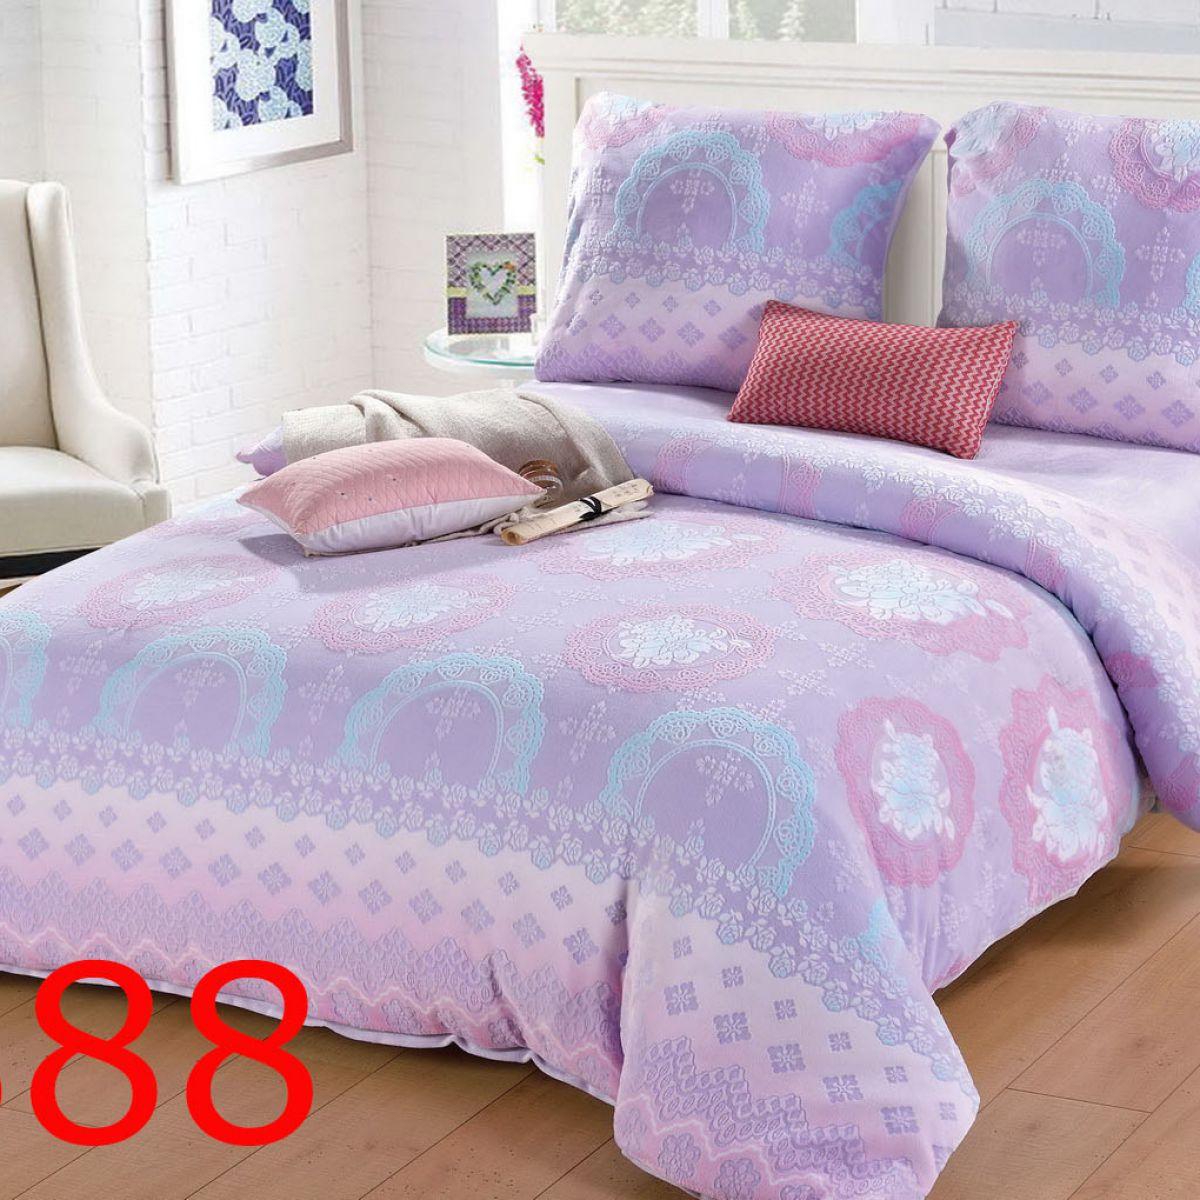 Plush Pressed Beddings - Cotton World - SHL-3808 - 220x200 cm - 3 pcs